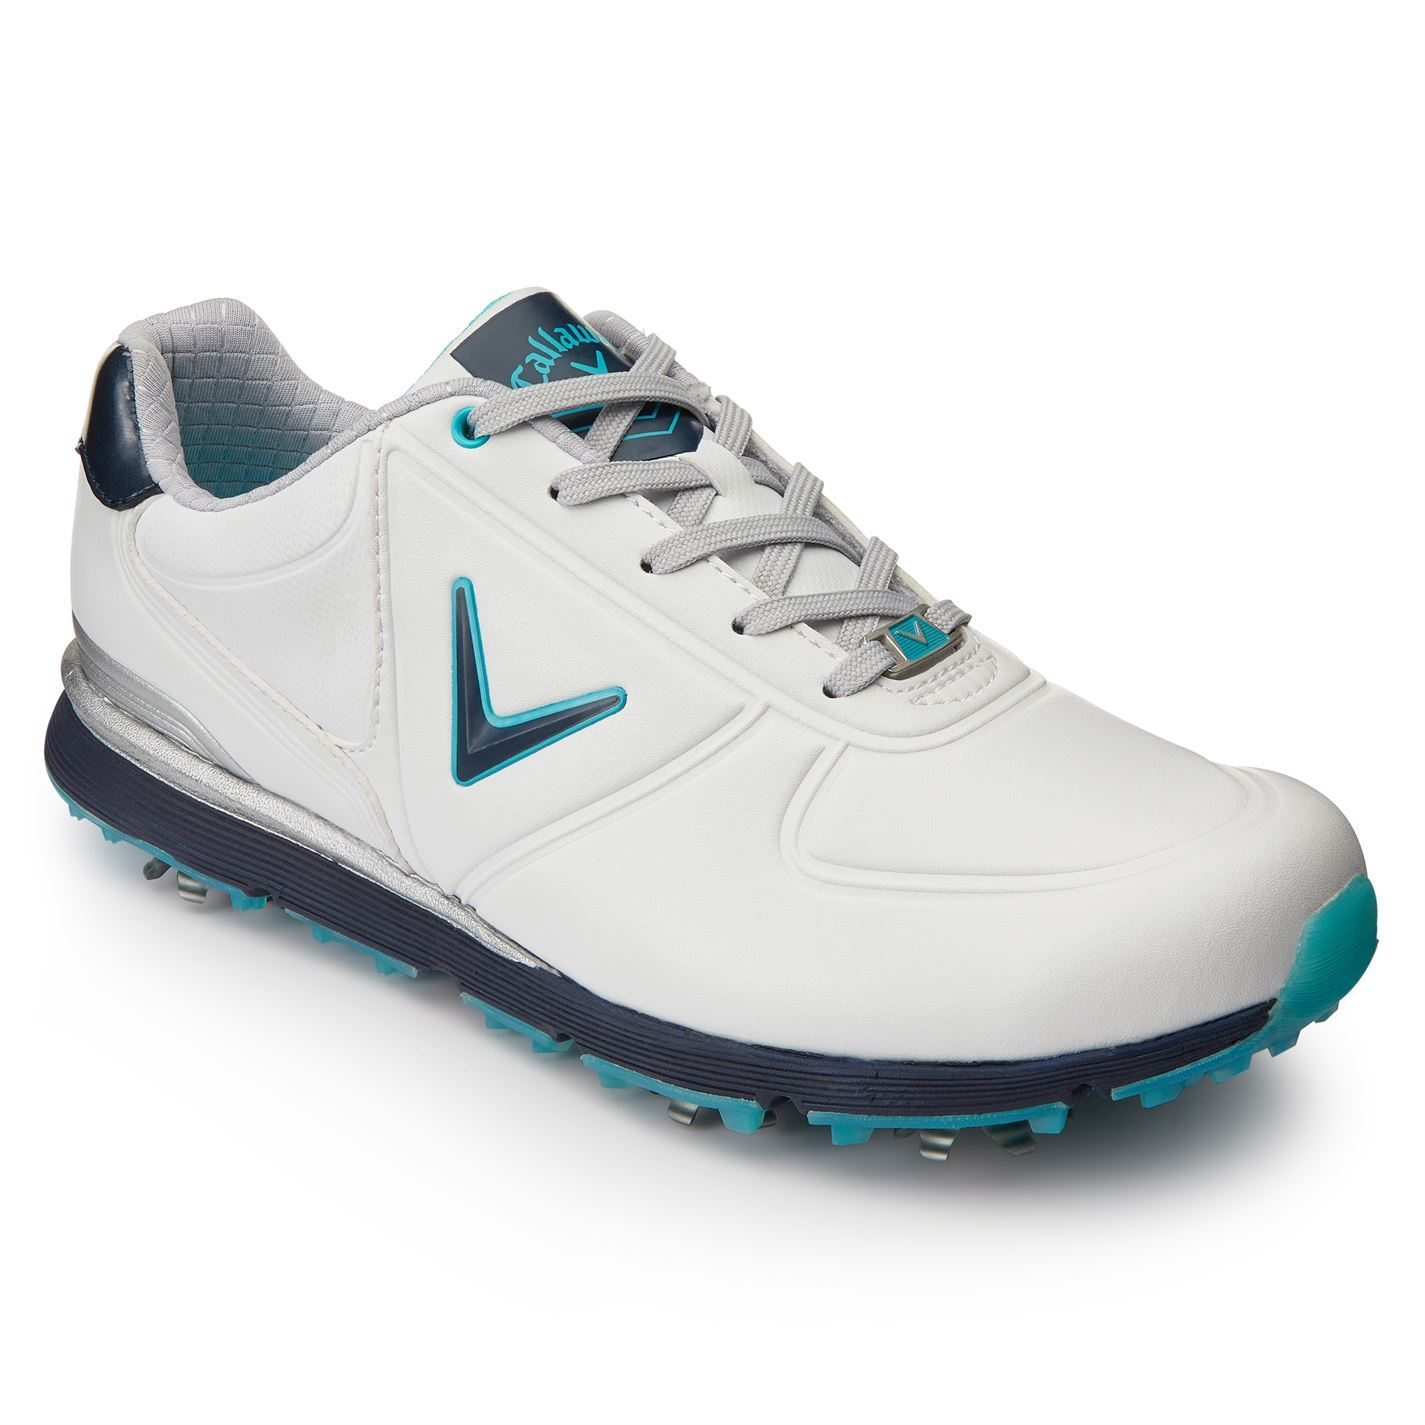 3dcd5b82178 Callaway-Misty-Golf-Shoe-Ladies-Spikes-Trainers-Footwear thumbnail